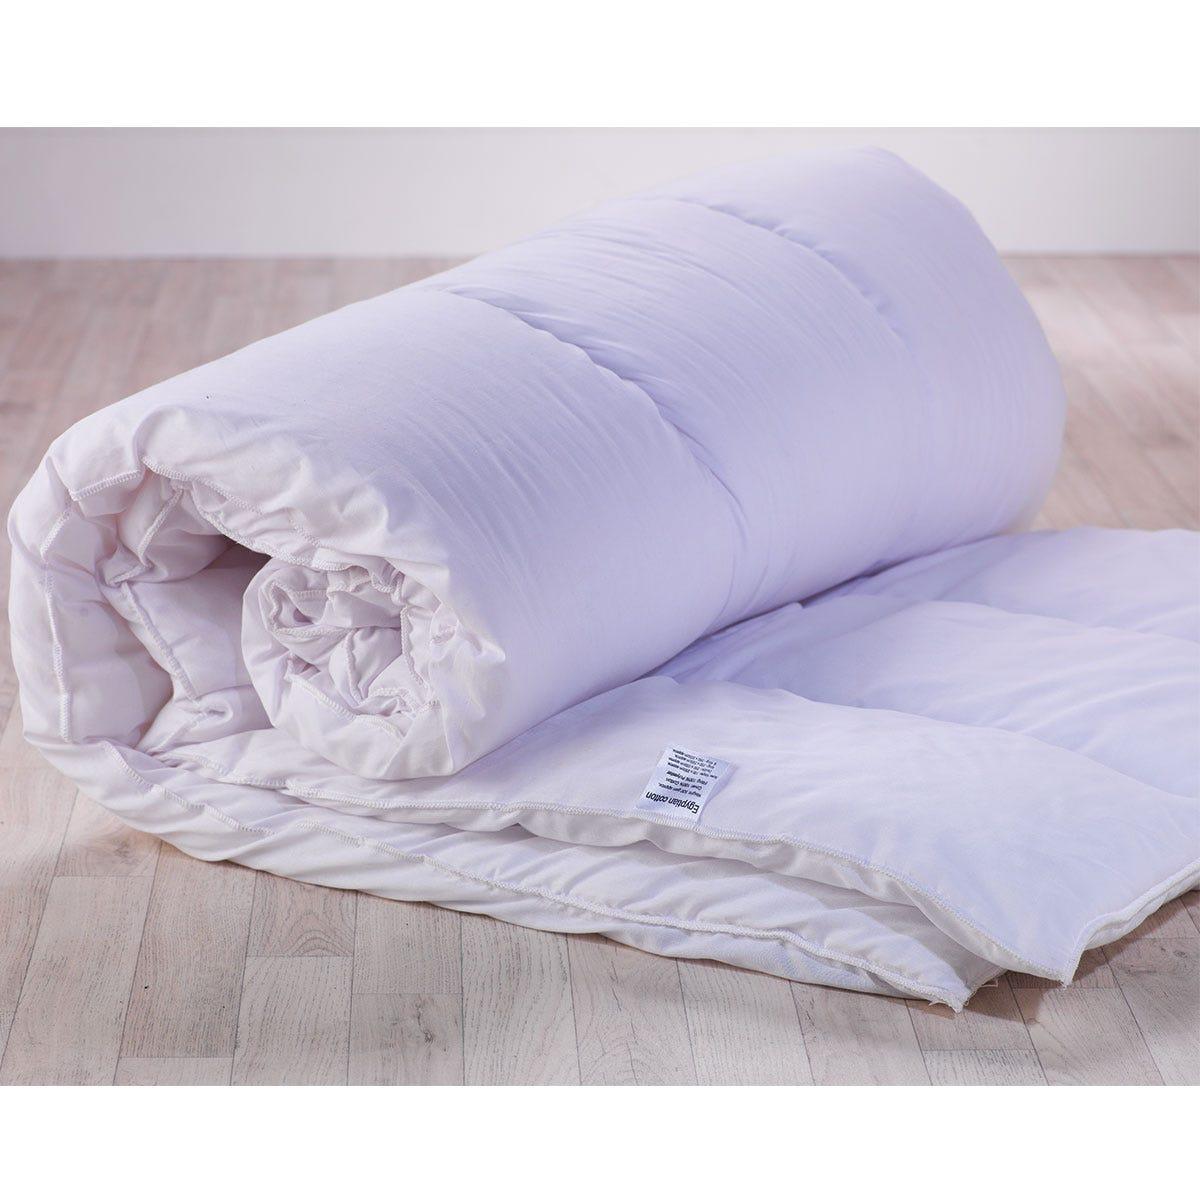 Lancashire Textiles 10.5 Tog Egyptian Cotton Duvet - Super King